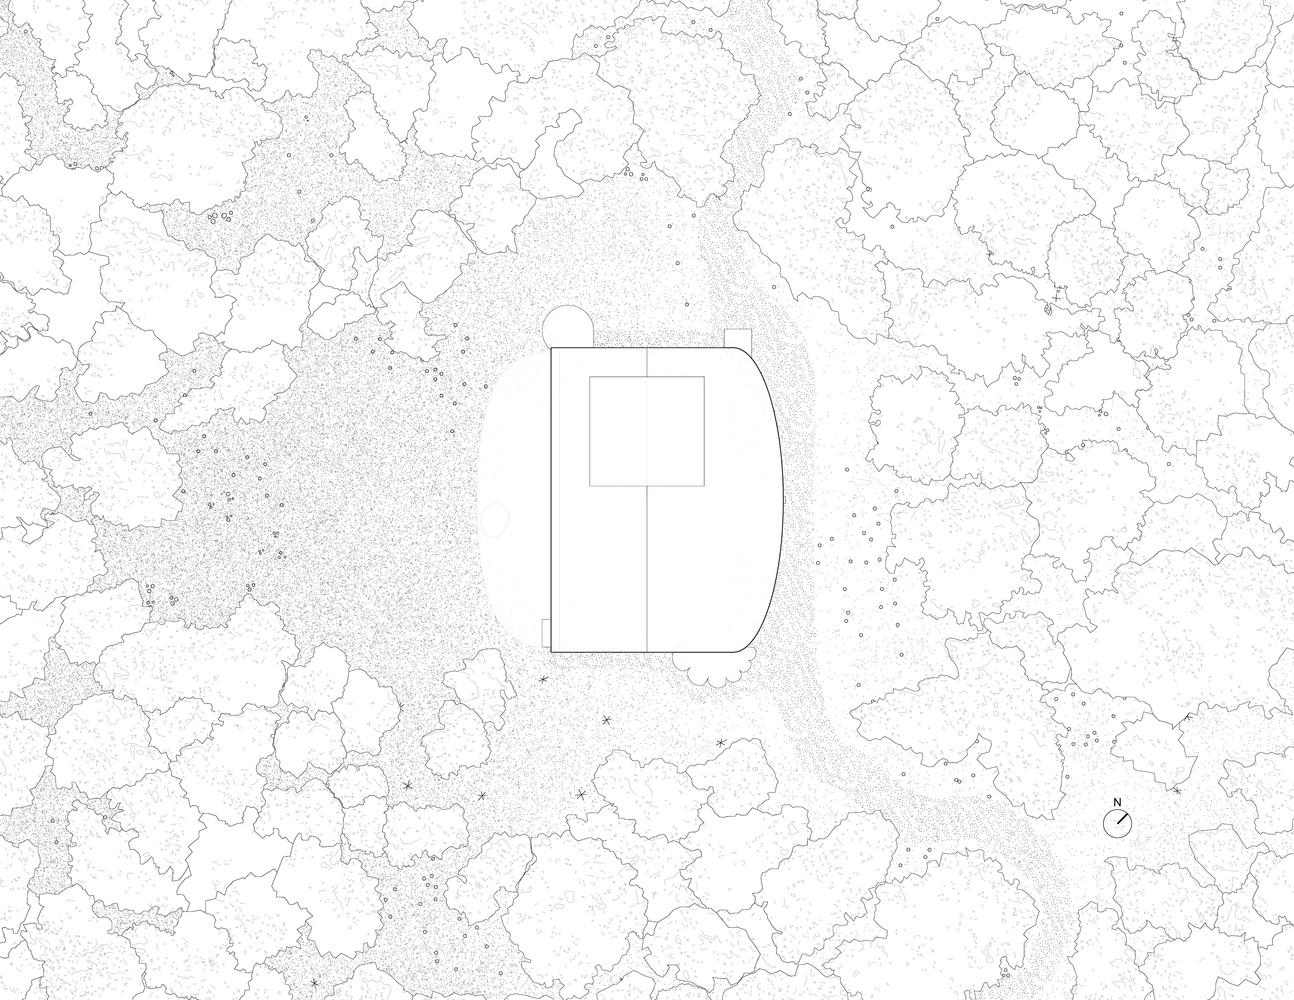 PARA-Project-.-Stump-House-.-Ben-Lomond-afasia-16.jpg